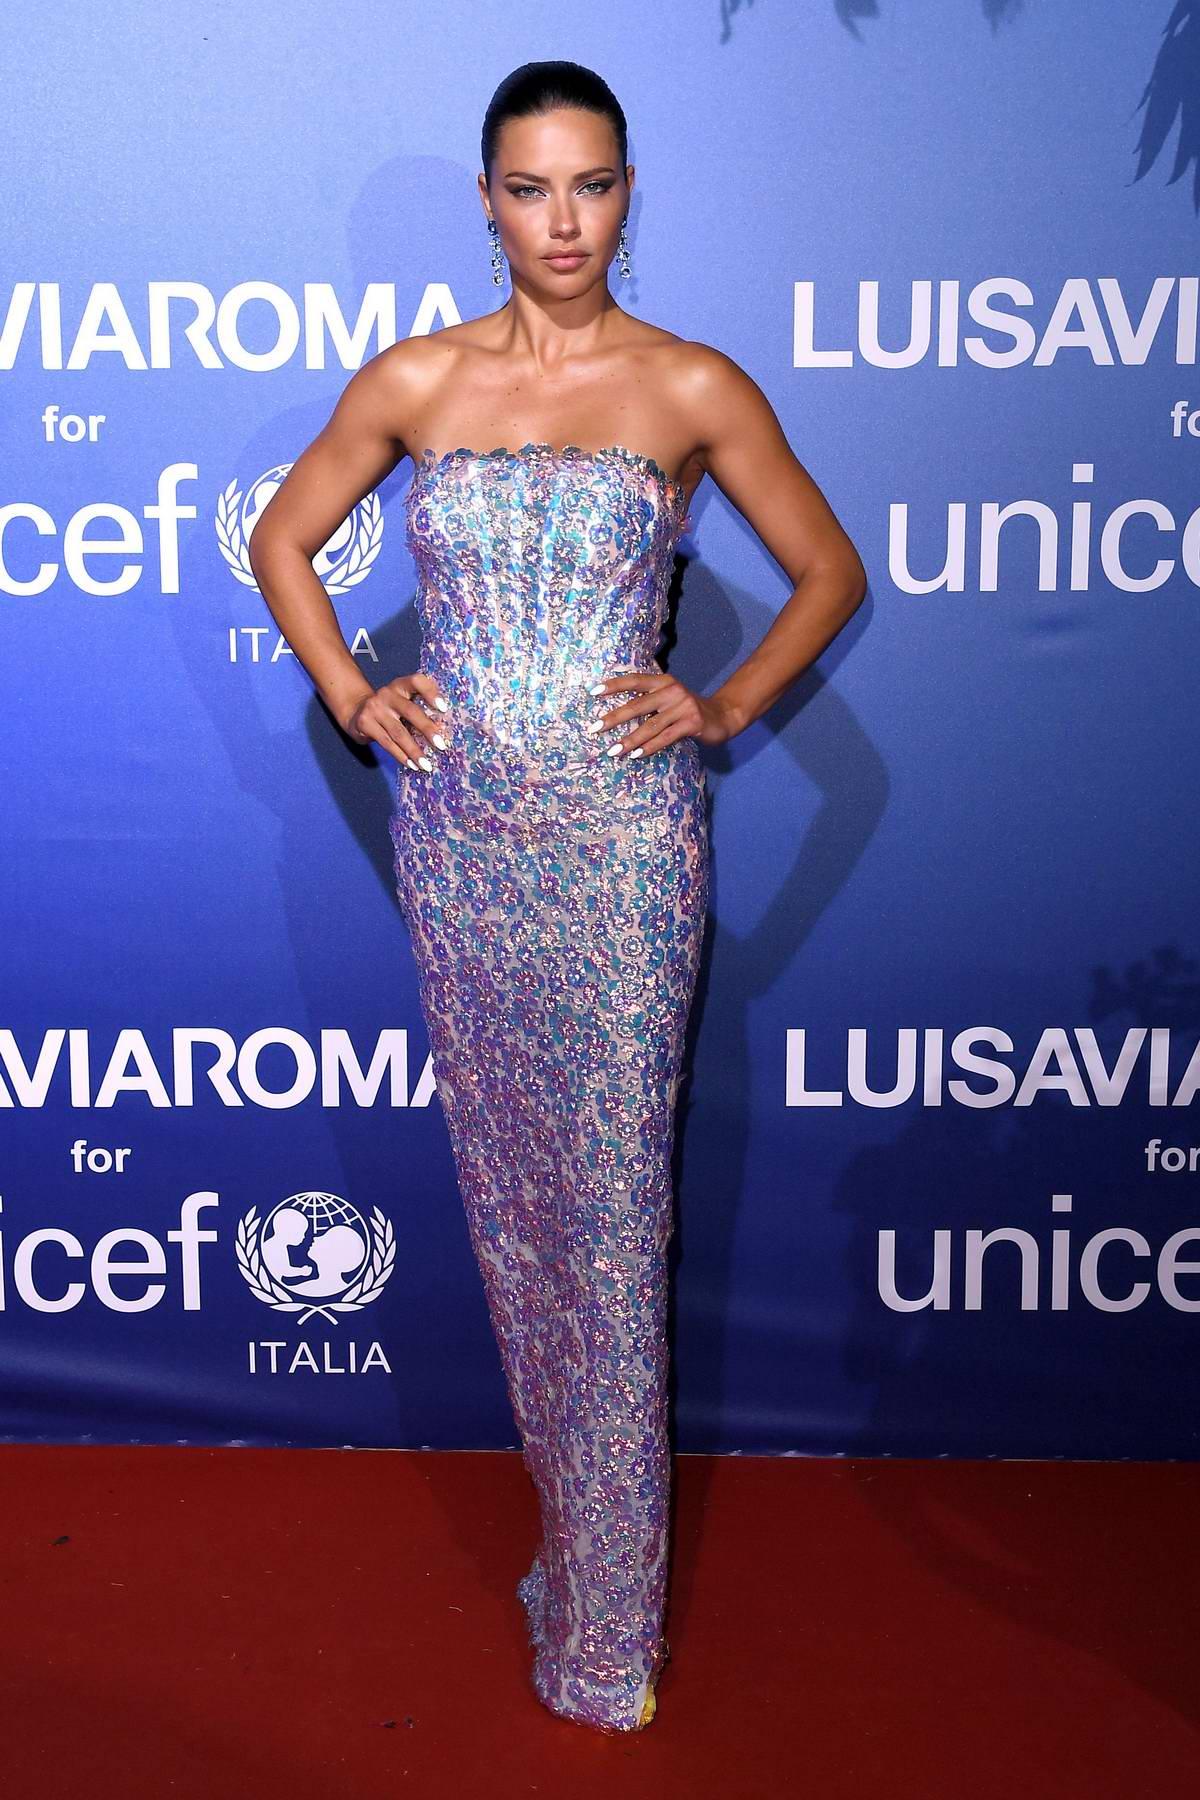 Adriana Lima attends the UNICEF Summer Gala presented by LuisaViaRoma in Sardinia, Italy